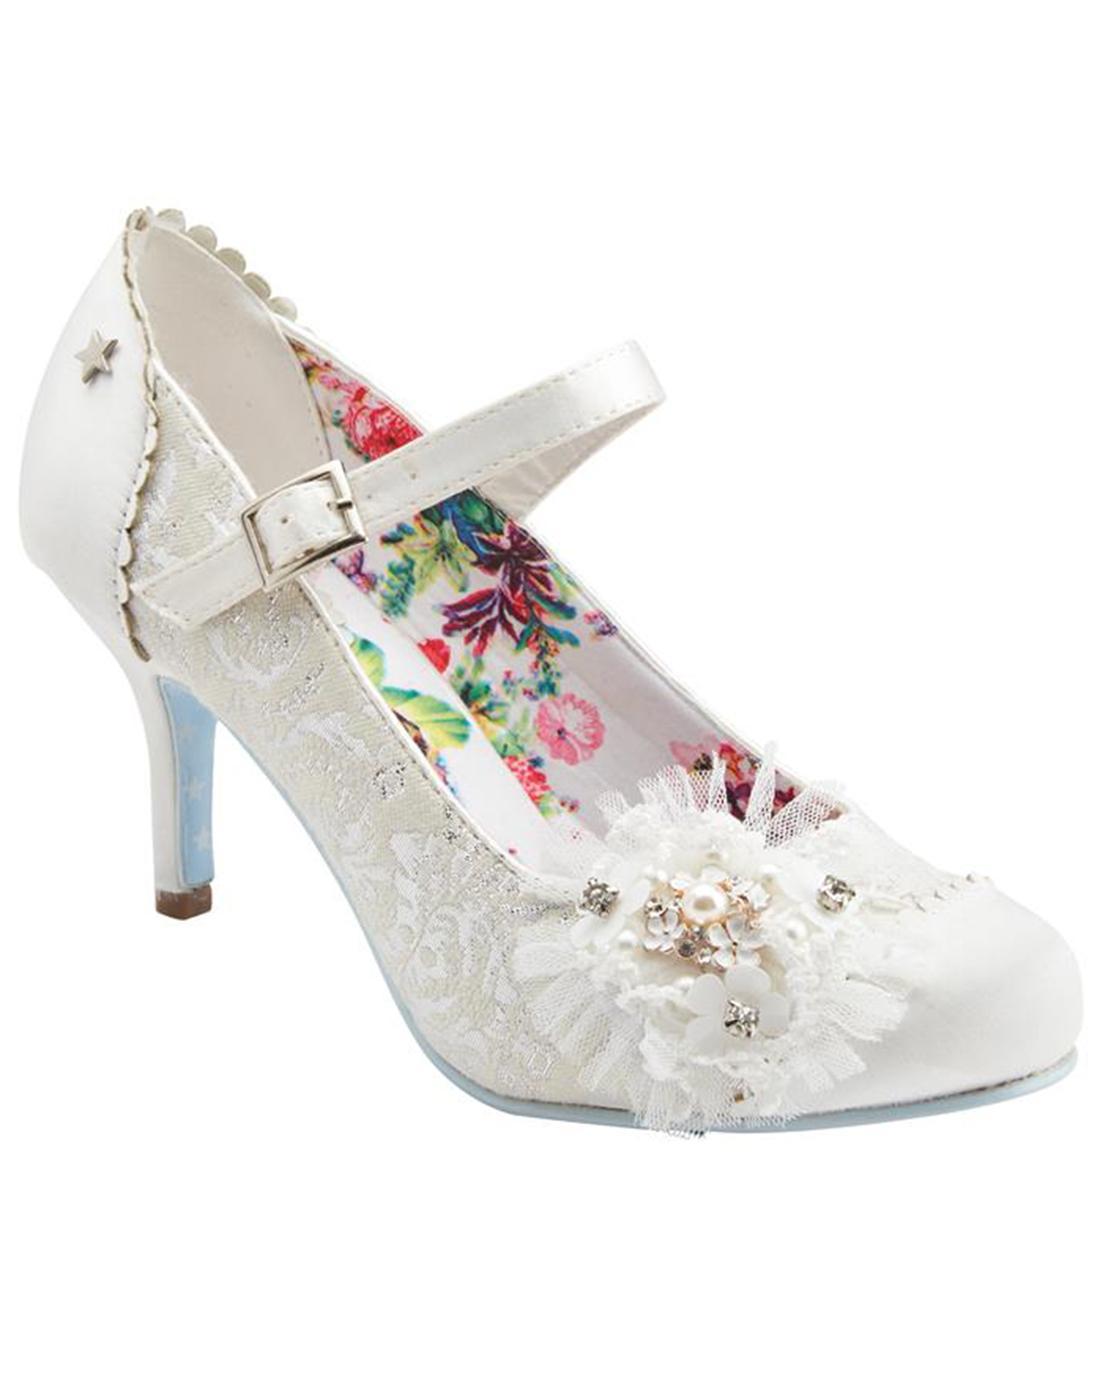 Hitched JOE BROWNS Vintage Bridal Court Shoes